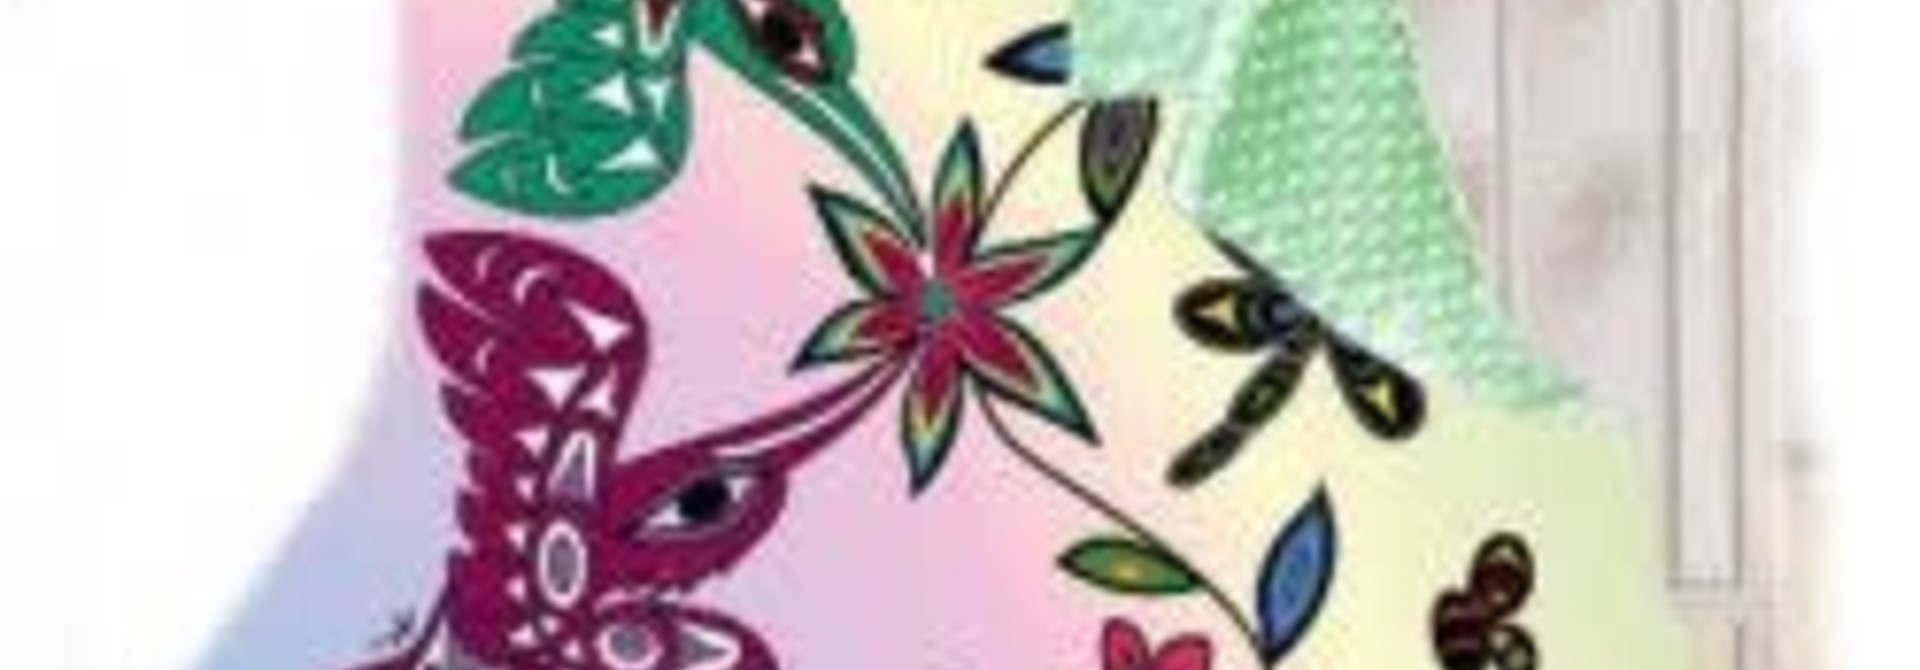 Baby Minky Blanket-Hummingbird by Douglas Horne